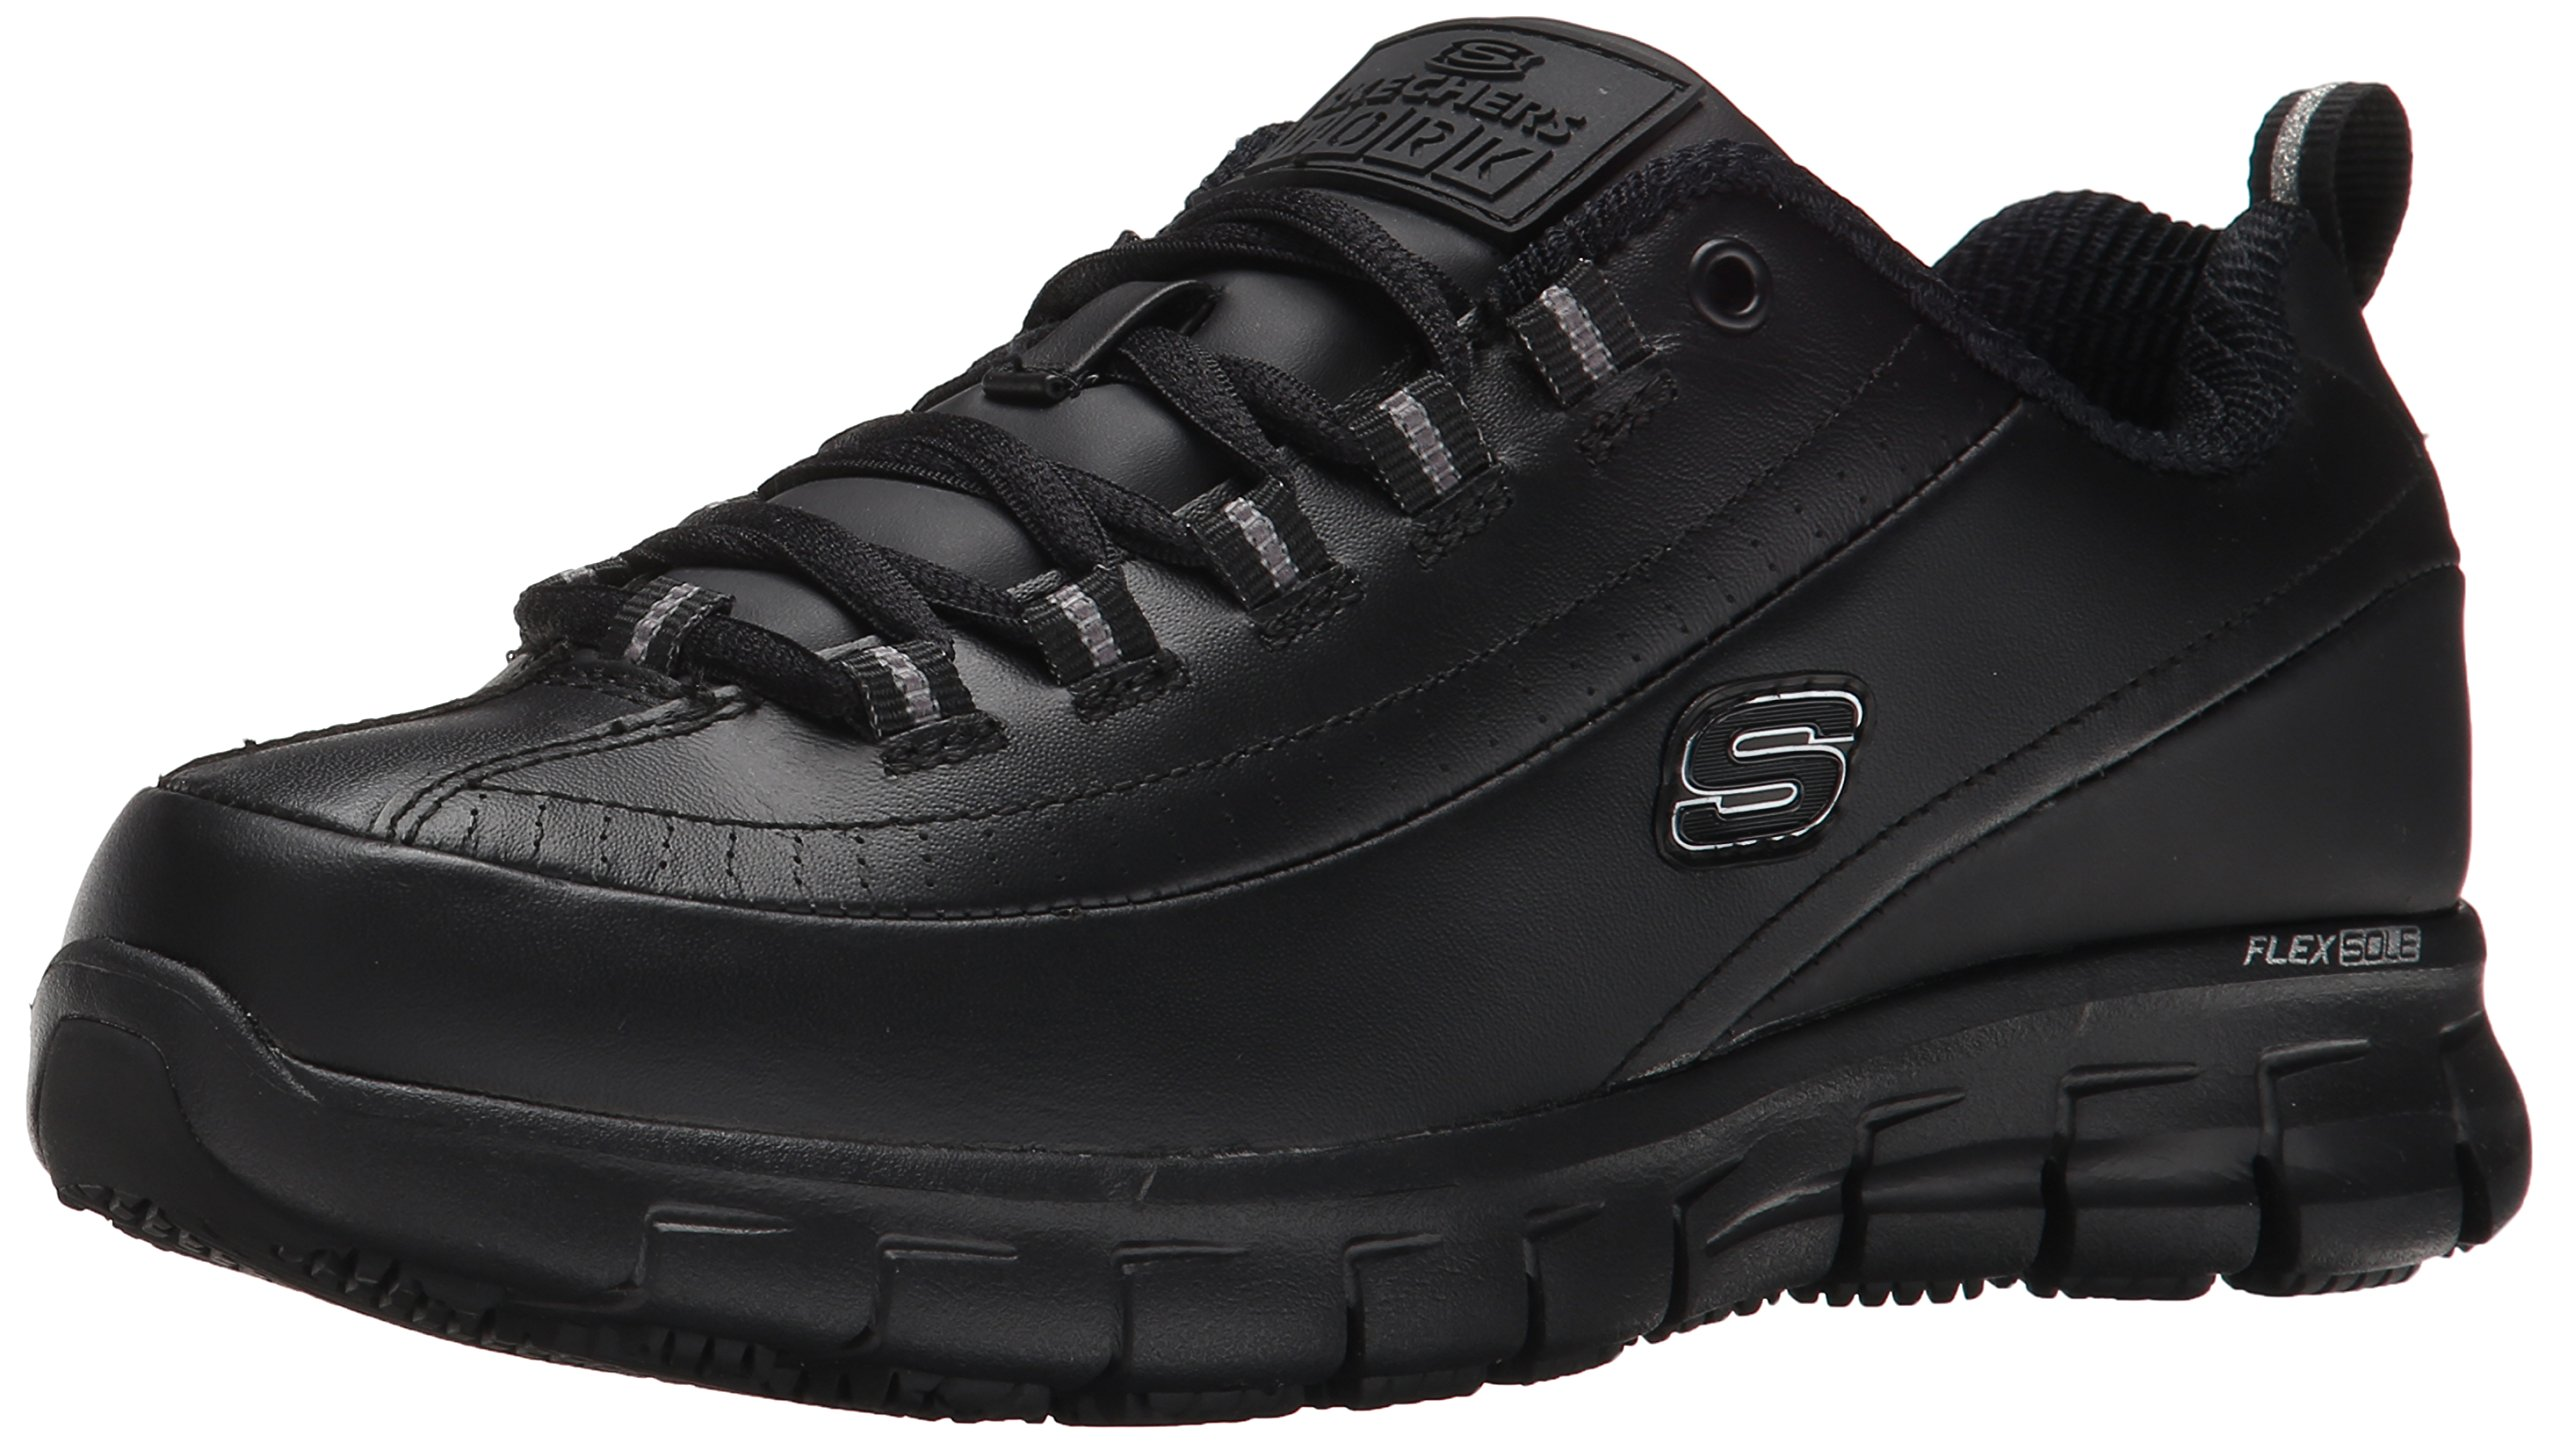 Skechers for Work Women's Sure Track Trickel Slip Resistant Work Shoe, Black, 6 XW US